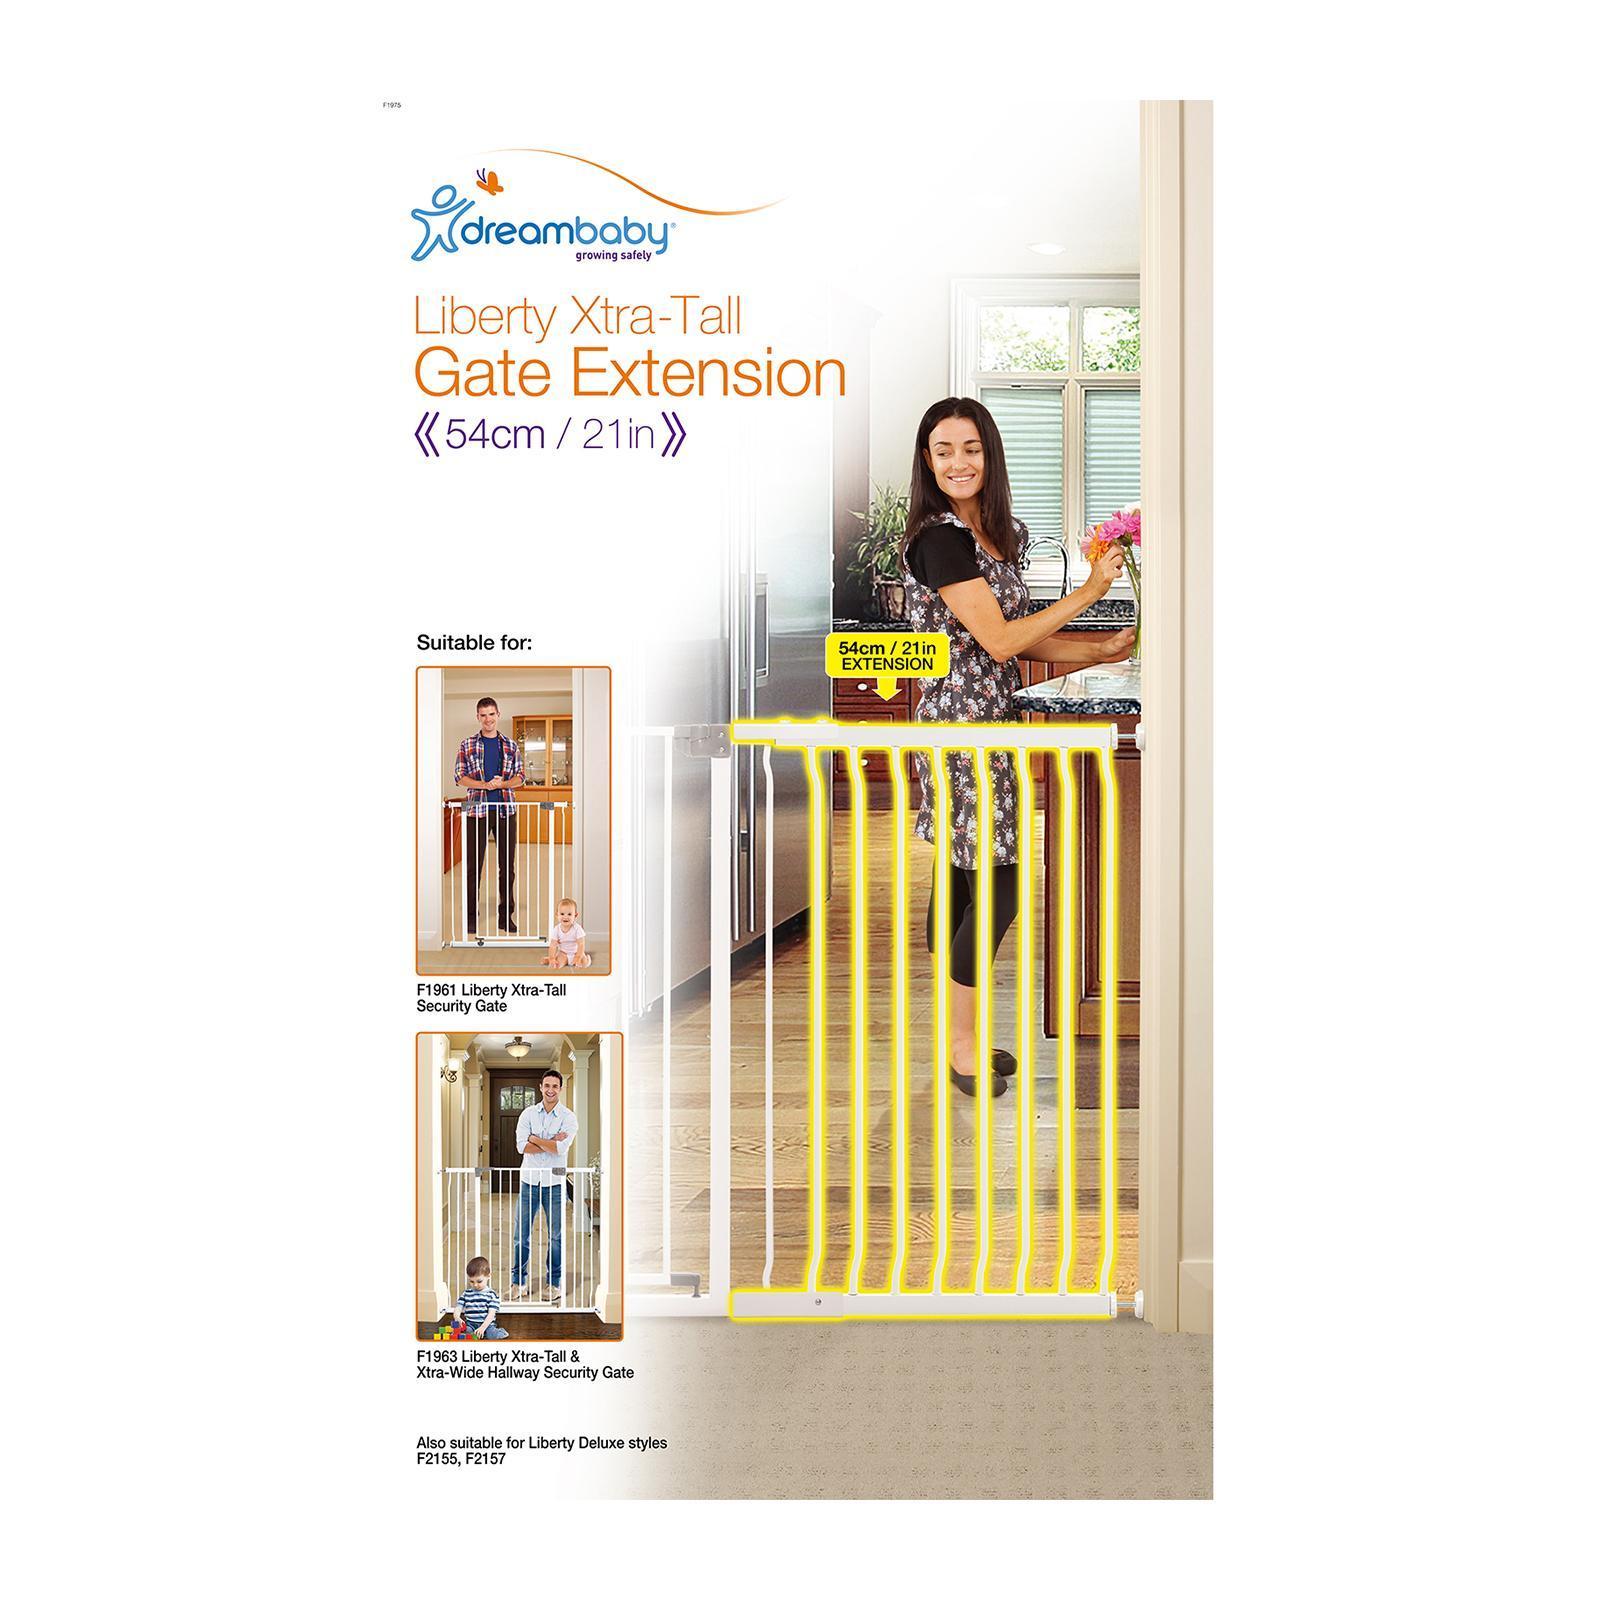 White Dreambaby 45cm Gate Extension